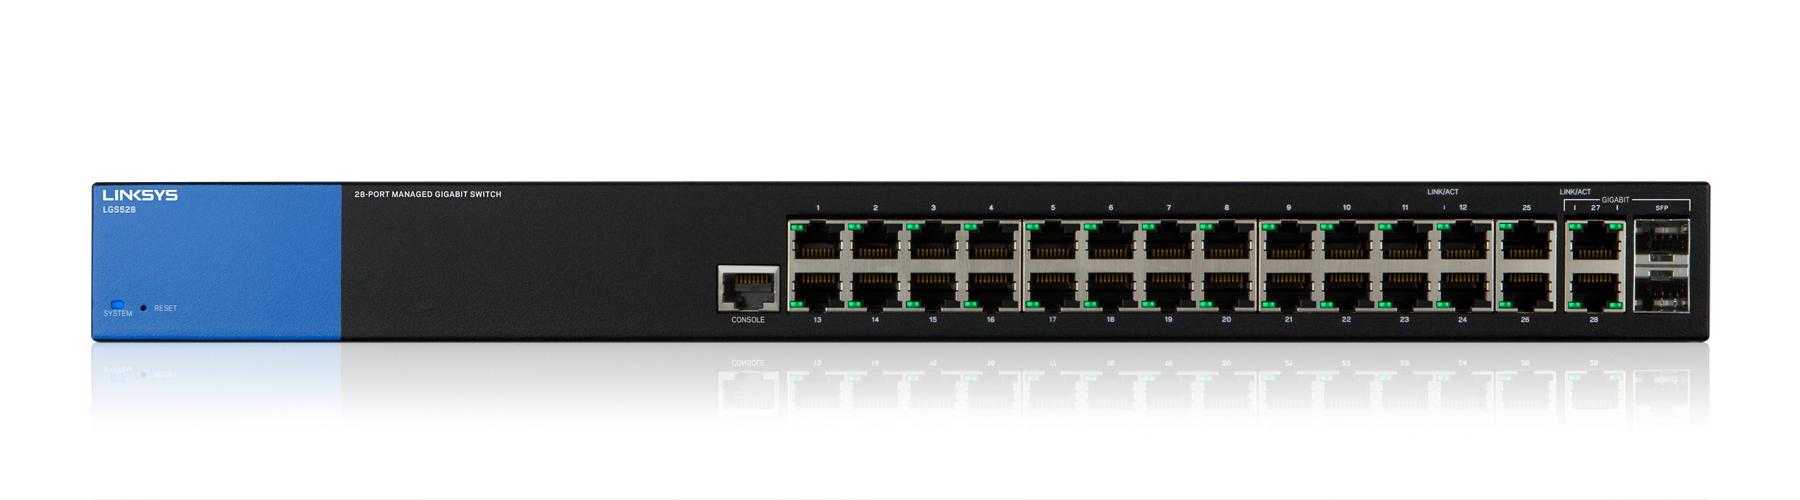 Linksys Switch Gigabit administrado de 28 puertos (LGS528)